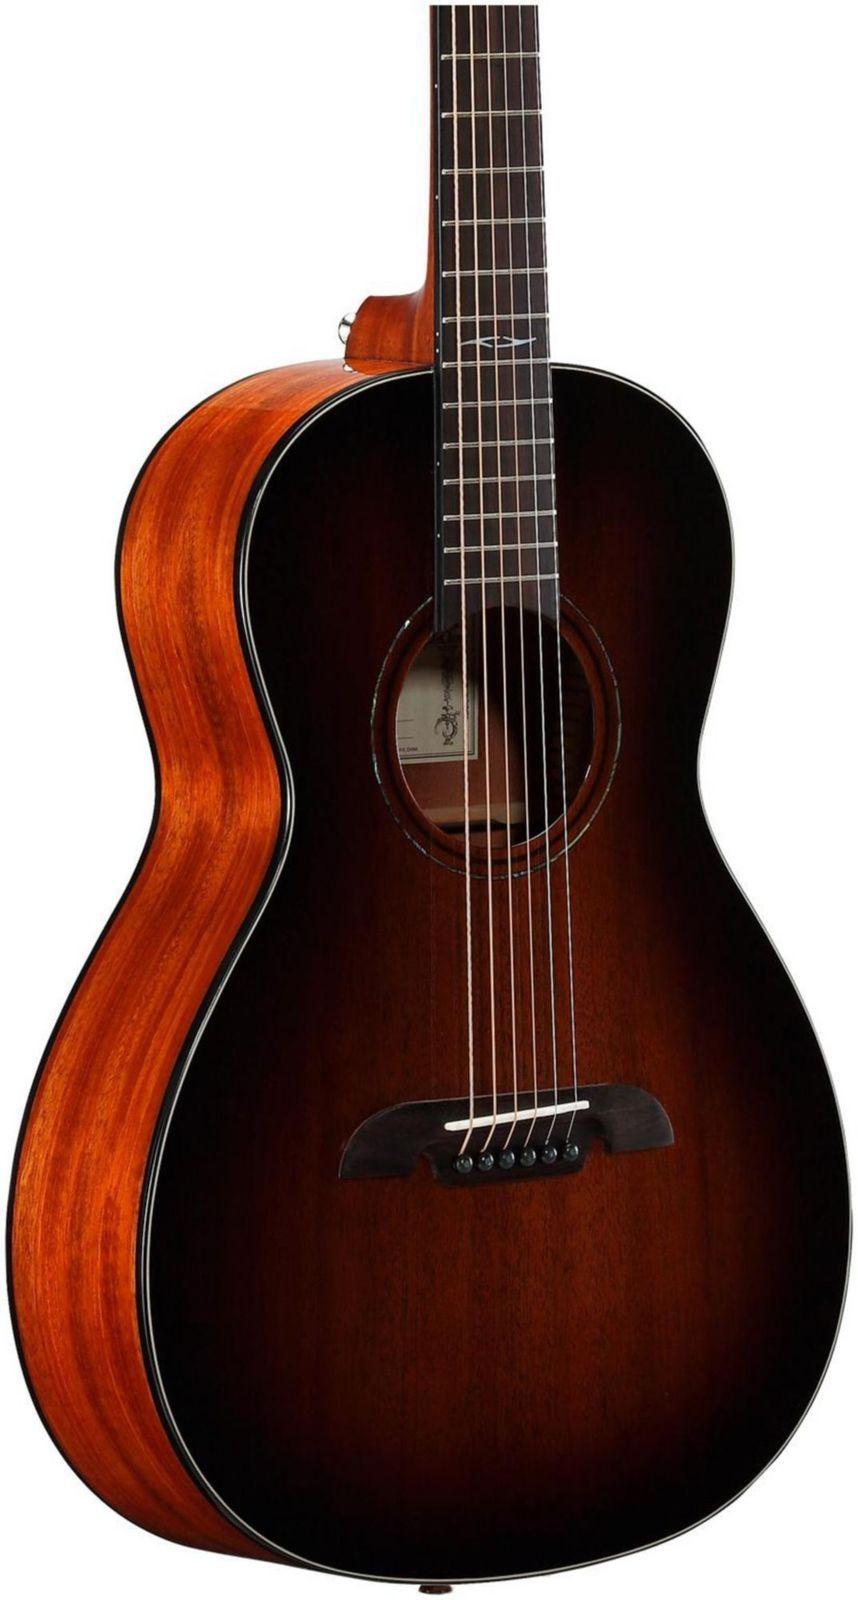 alvarez ap66shb parlor acoustic guitar shadow burst guitarras guitarras. Black Bedroom Furniture Sets. Home Design Ideas